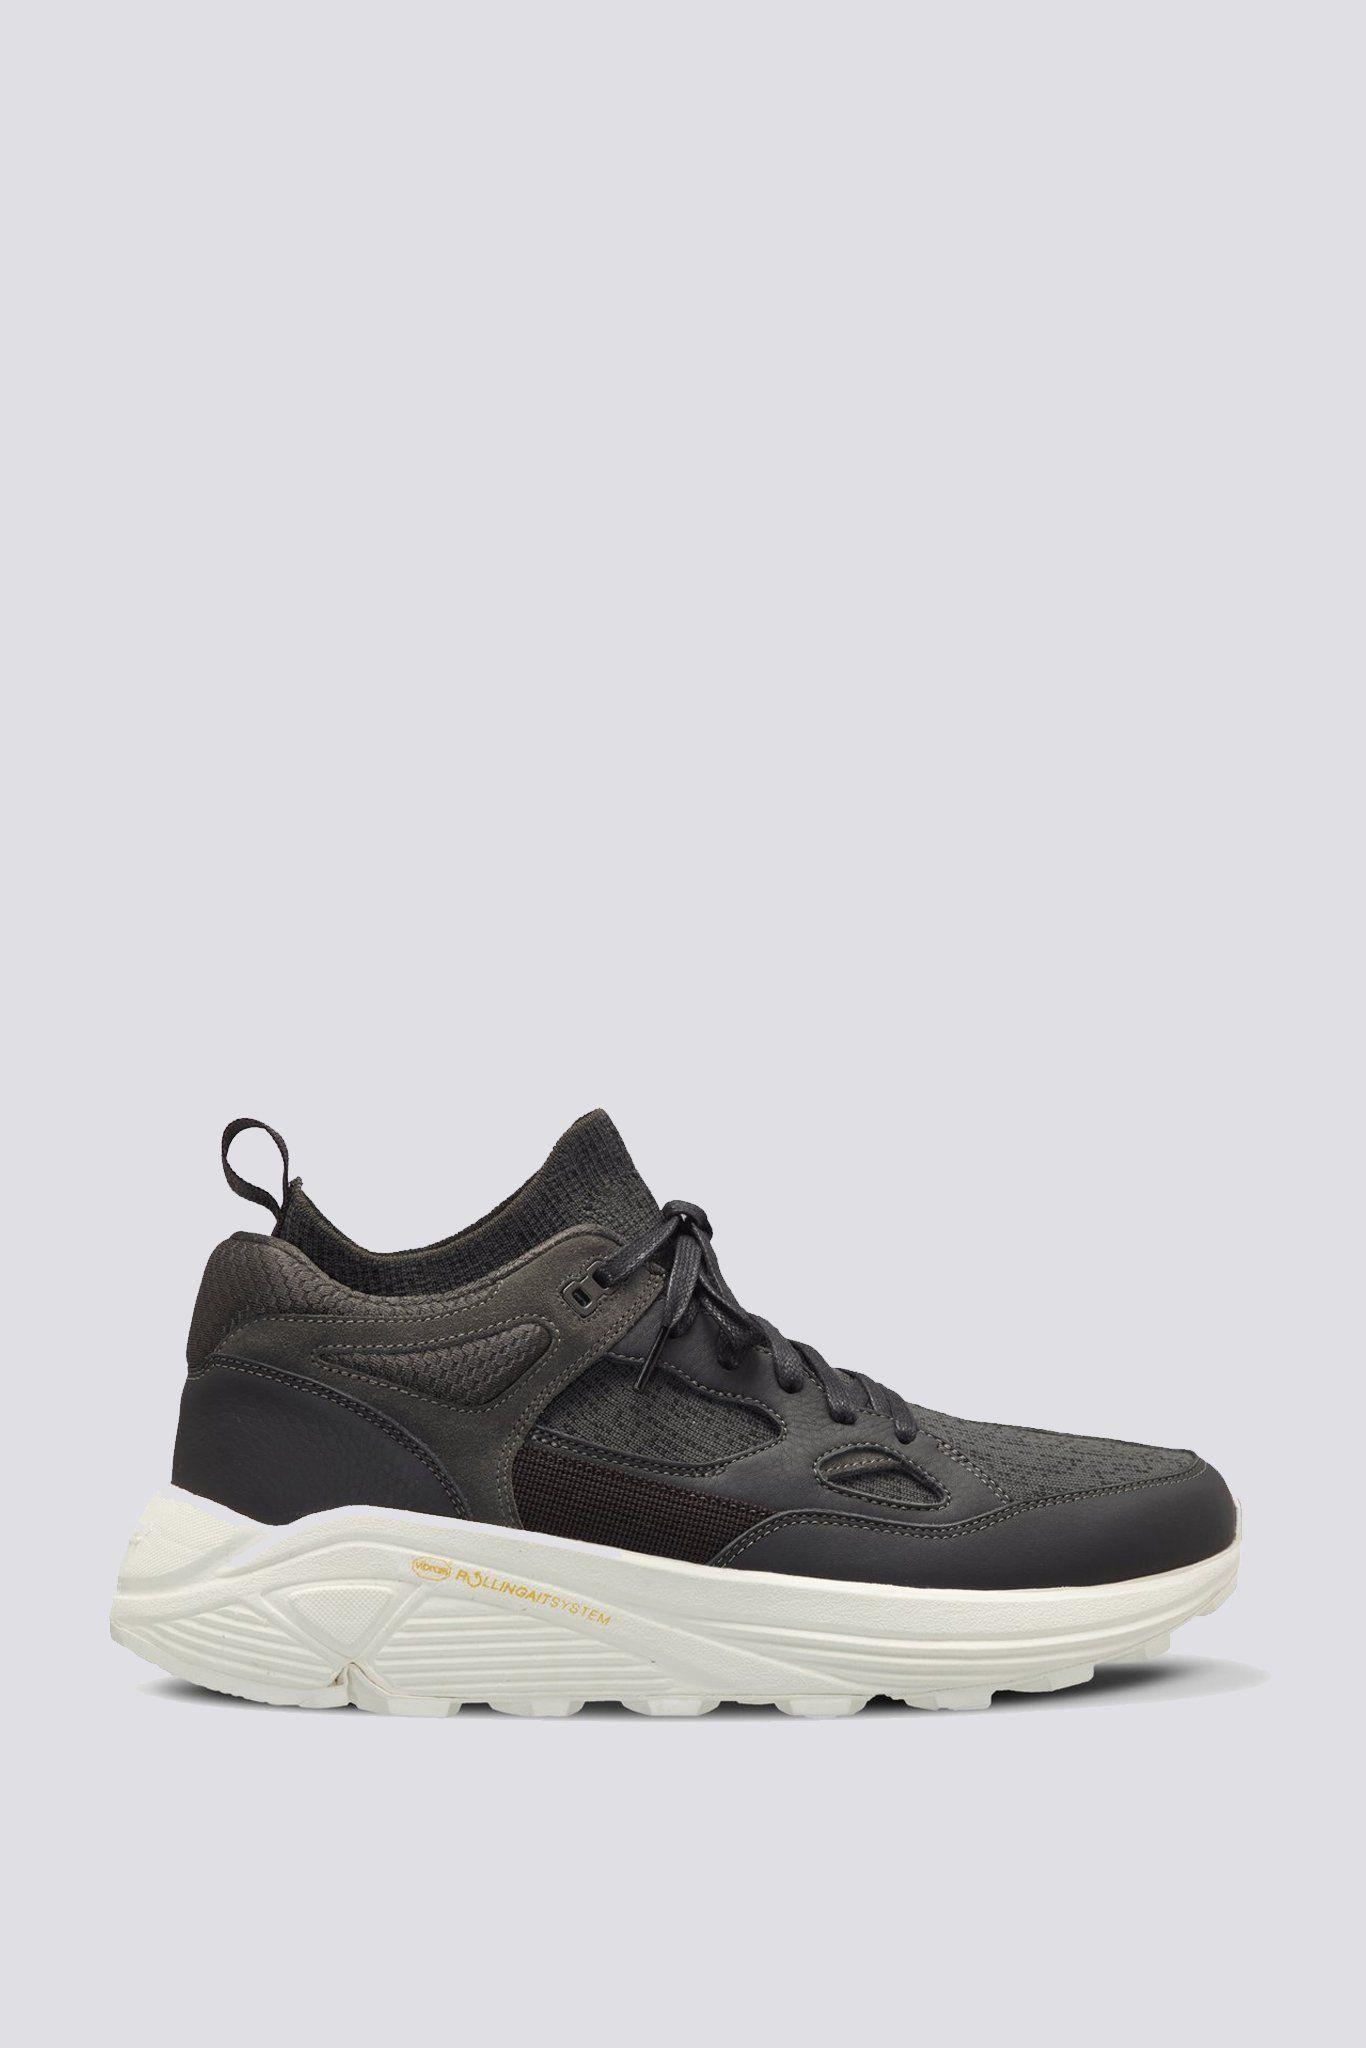 6f114dbabf66 Aura sneaker from Brandblack. Vibram rolling gait technology sole. Full  grain nappa leather upper. Full grain leather sock line. High rebound  jetlon + ...